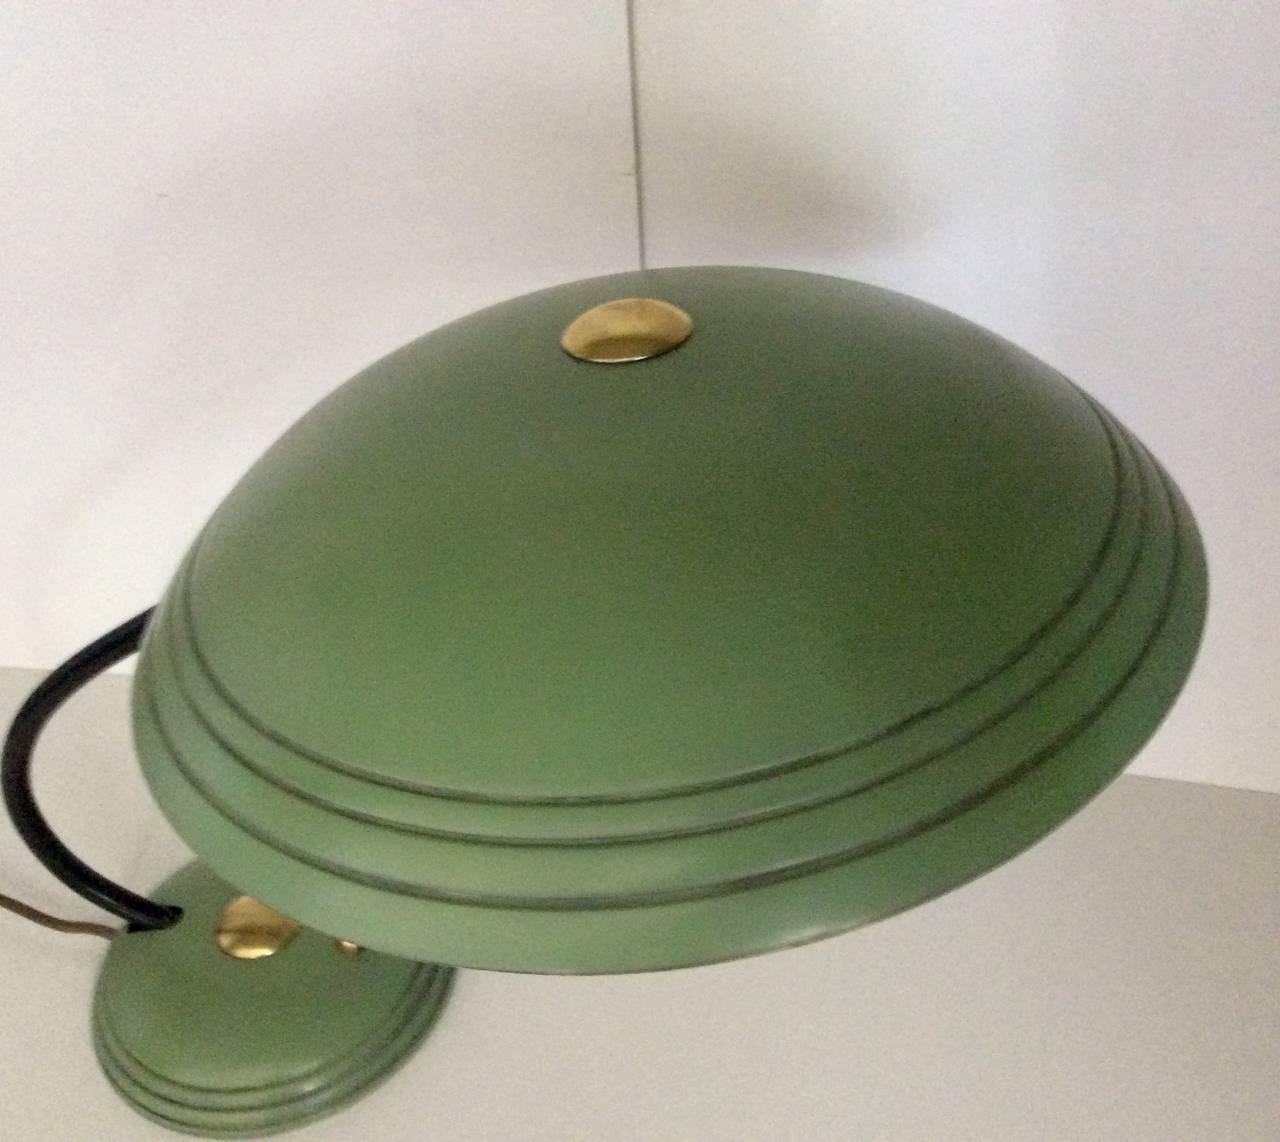 Helo flying saucer desk lamp at 1stdibs helo flying saucer desk lamp 2 arubaitofo Images